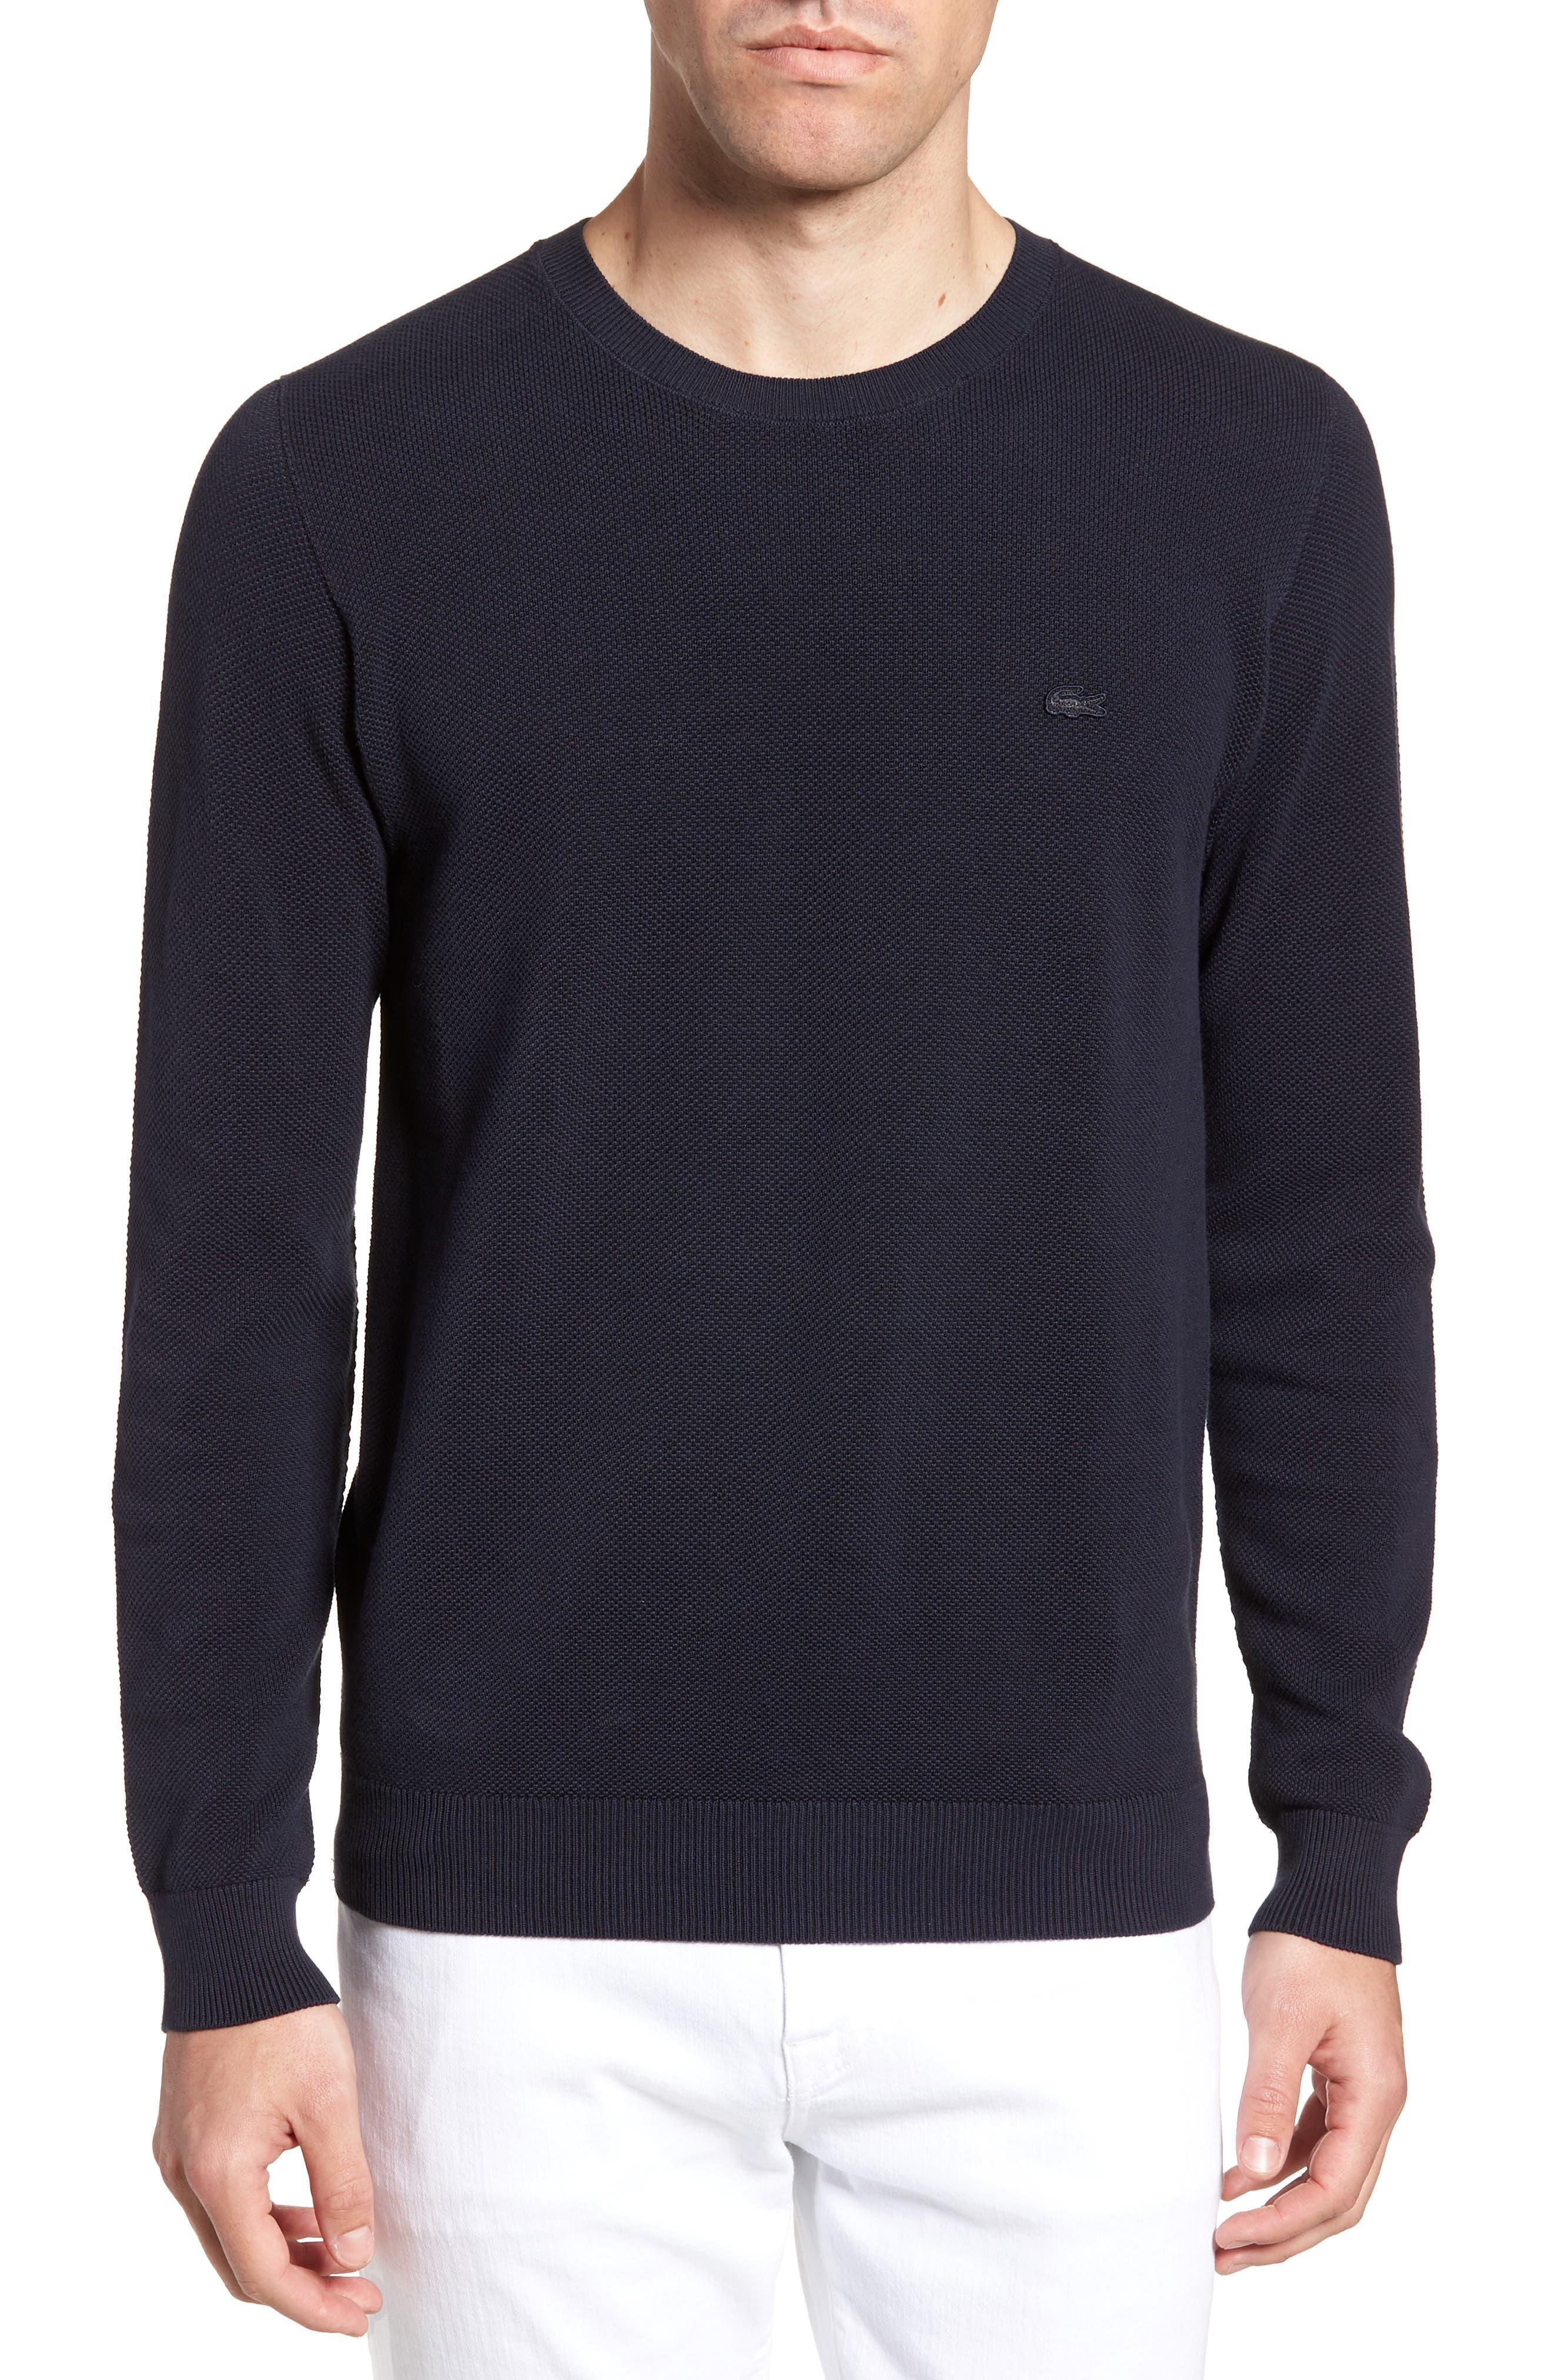 Piqué Cotton Sweater,                         Main,                         color, Dark Navy Blue